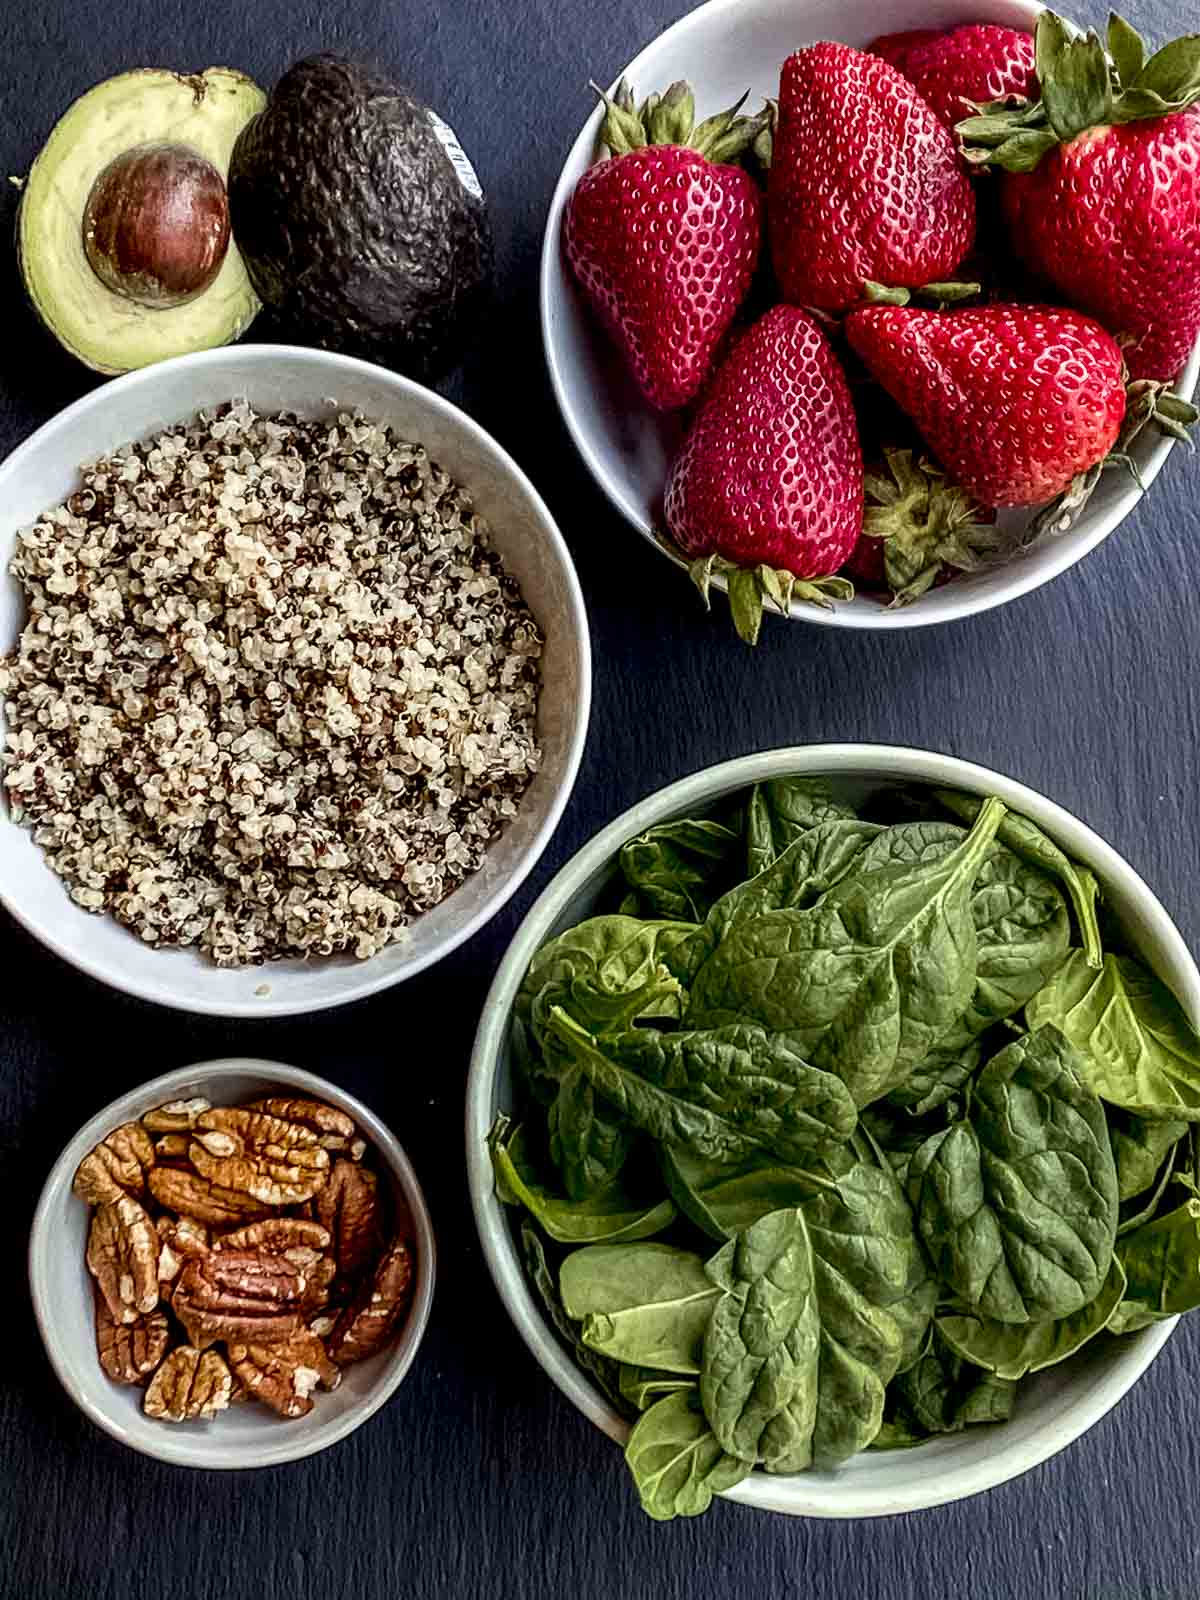 Ingredients to make spinach salad: strawberries, quinoa. avocado, pecans, spinach